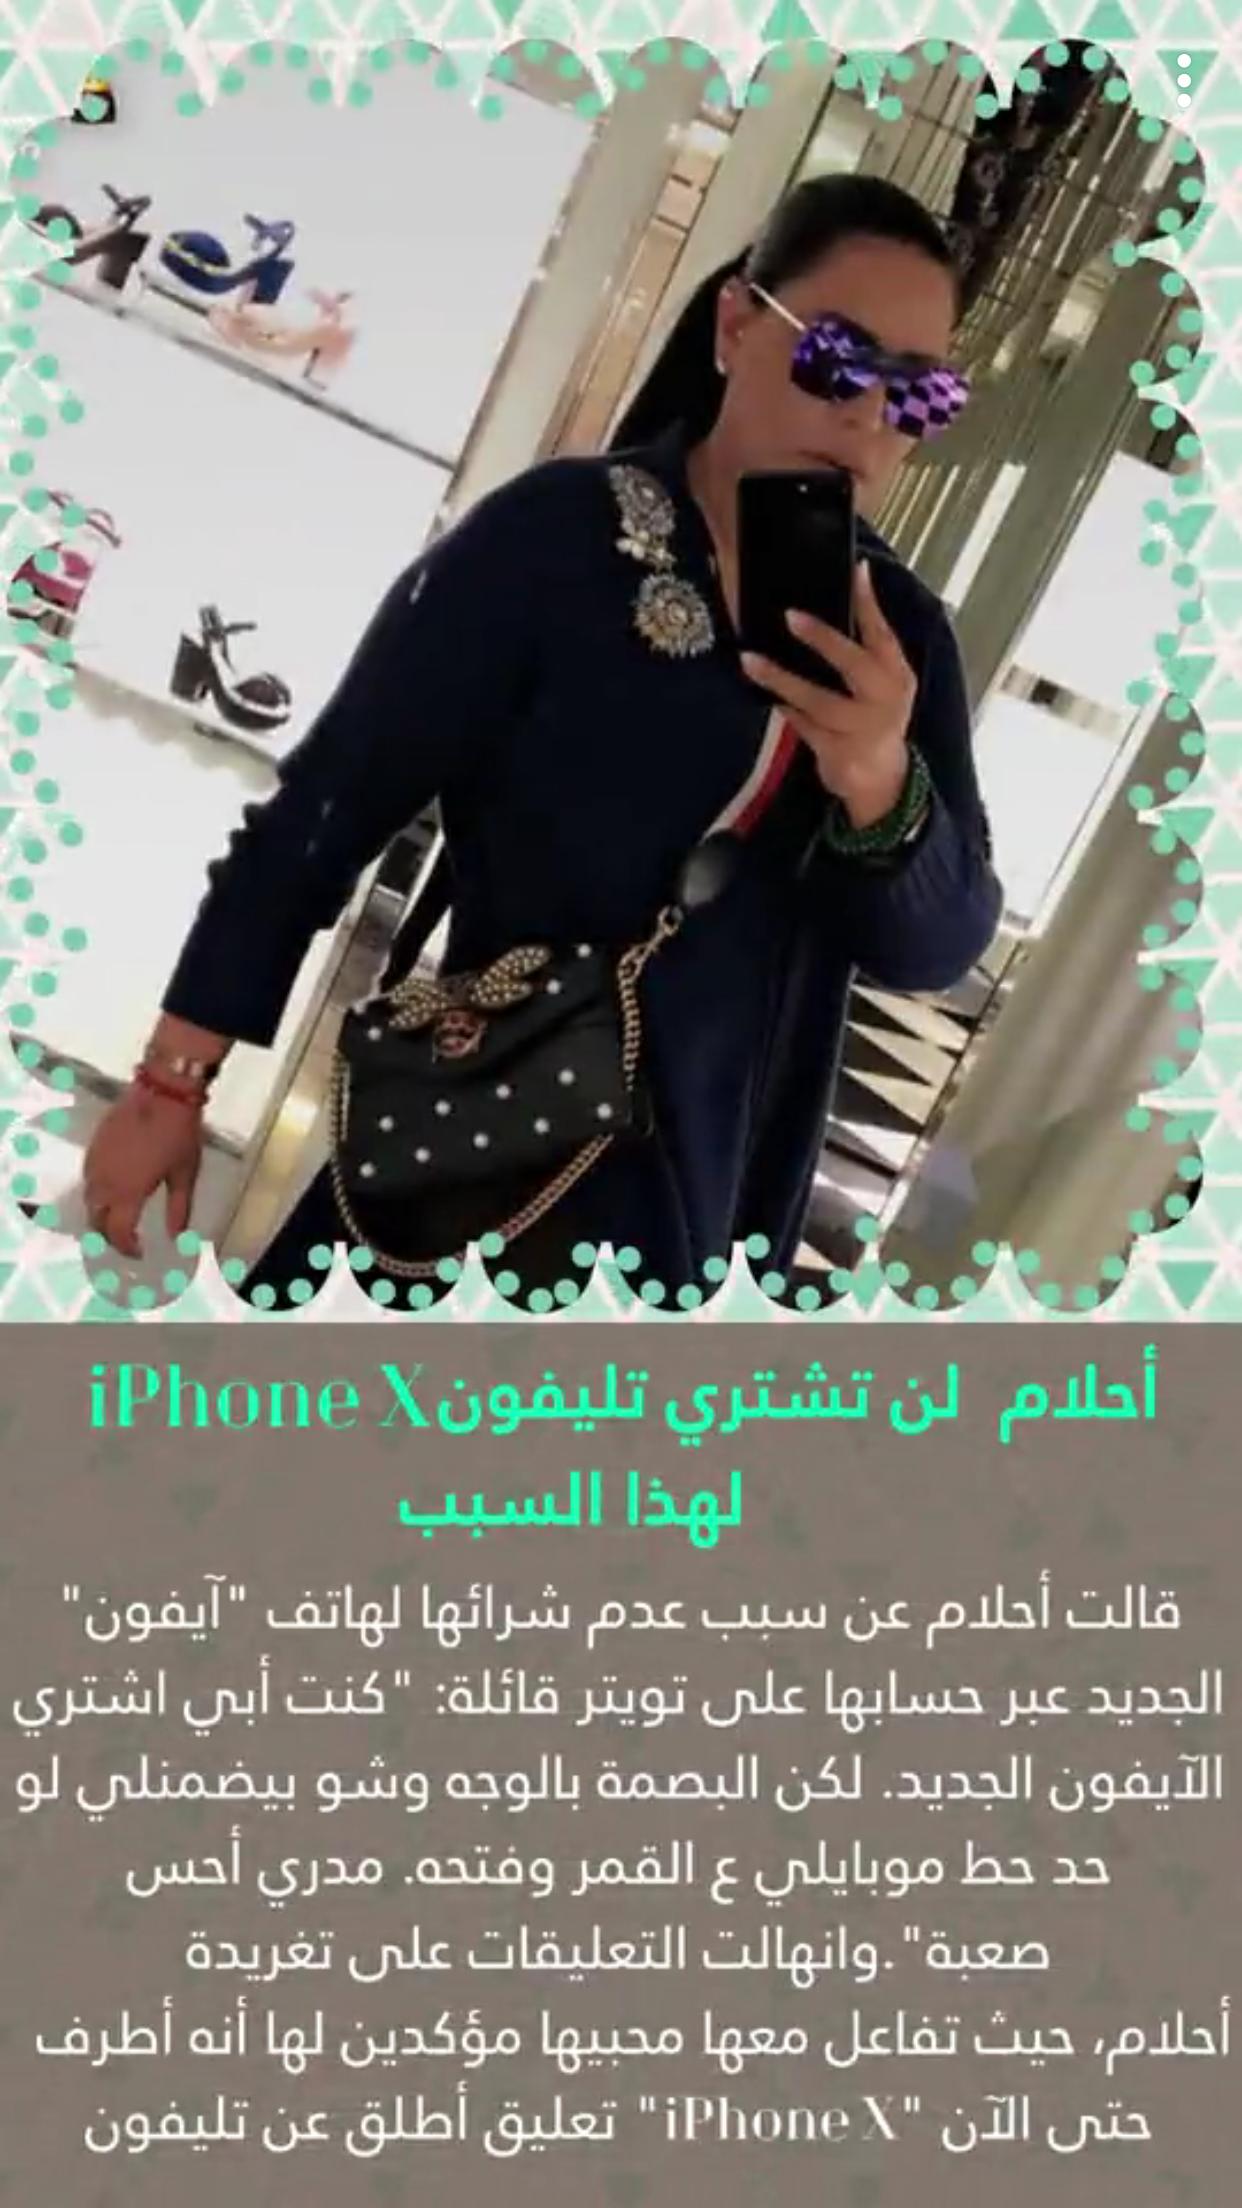 Pin By روابى المطيرى On فنانة أحلام Louis Vuitton Speedy Fashion Louis Vuitton Speedy Bag